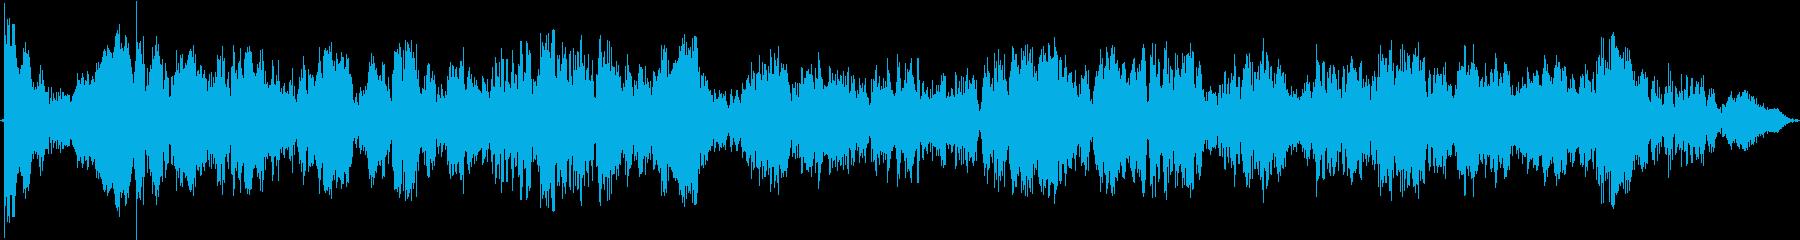 SciFi EC03_96_1の再生済みの波形